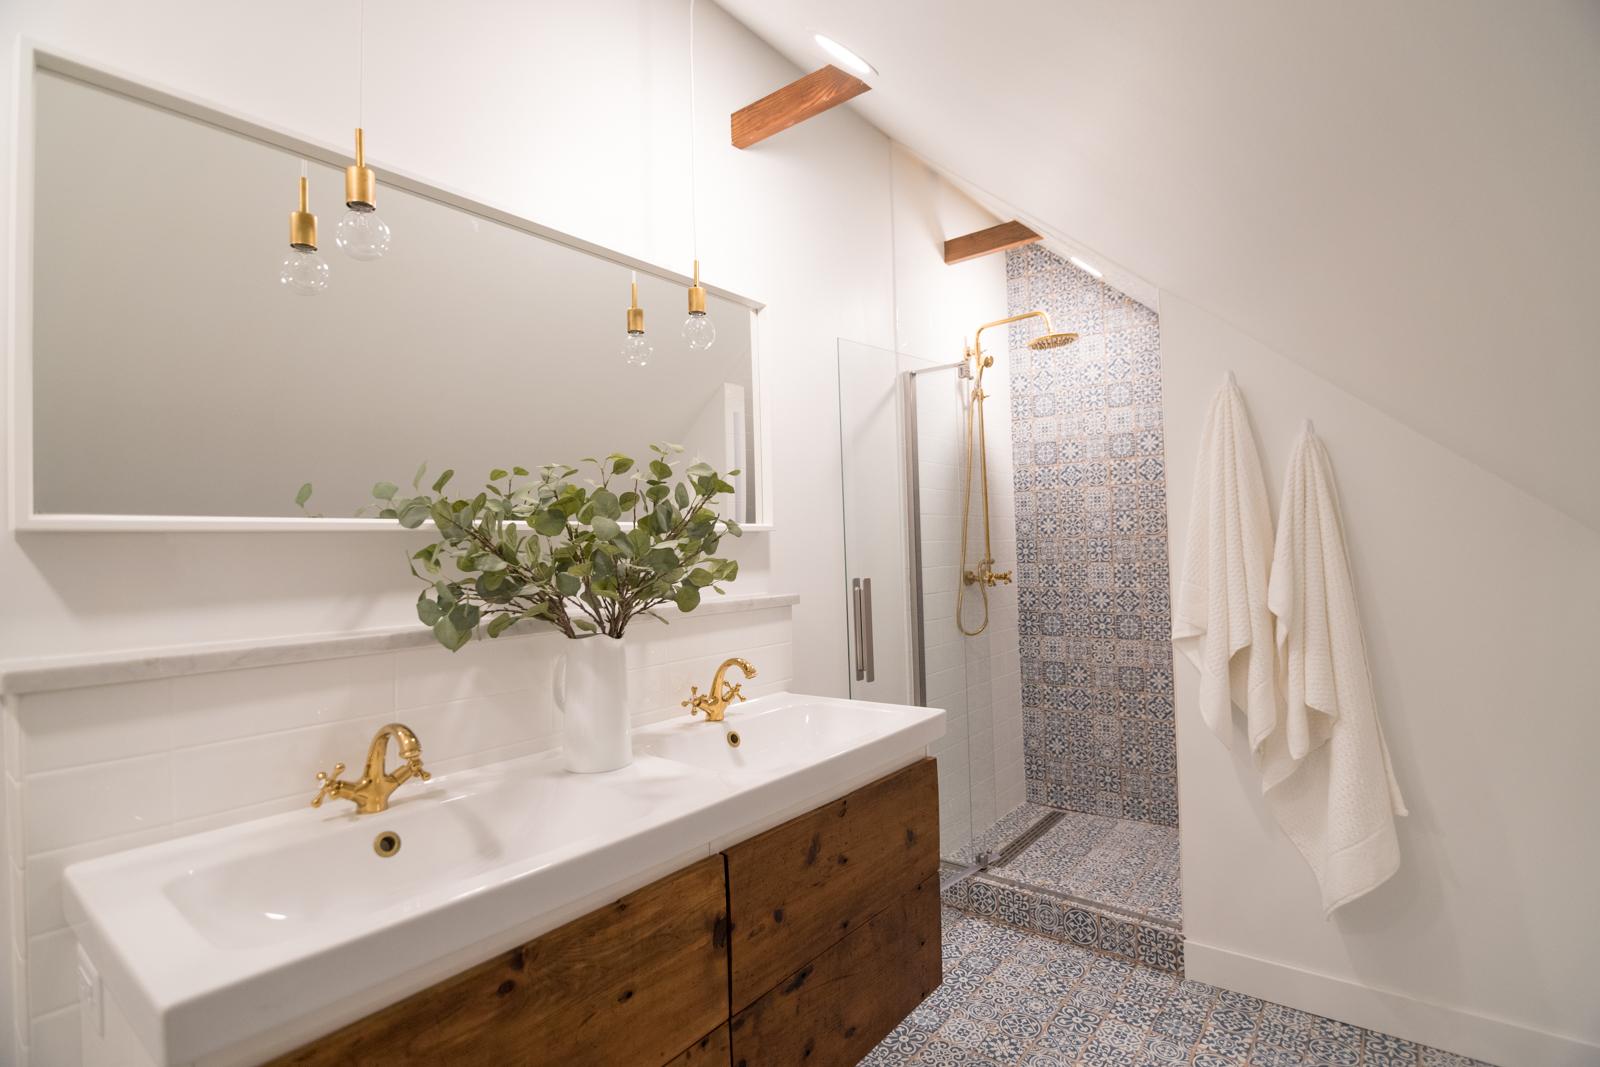 #dermreno master bath reclaimed wood vanity